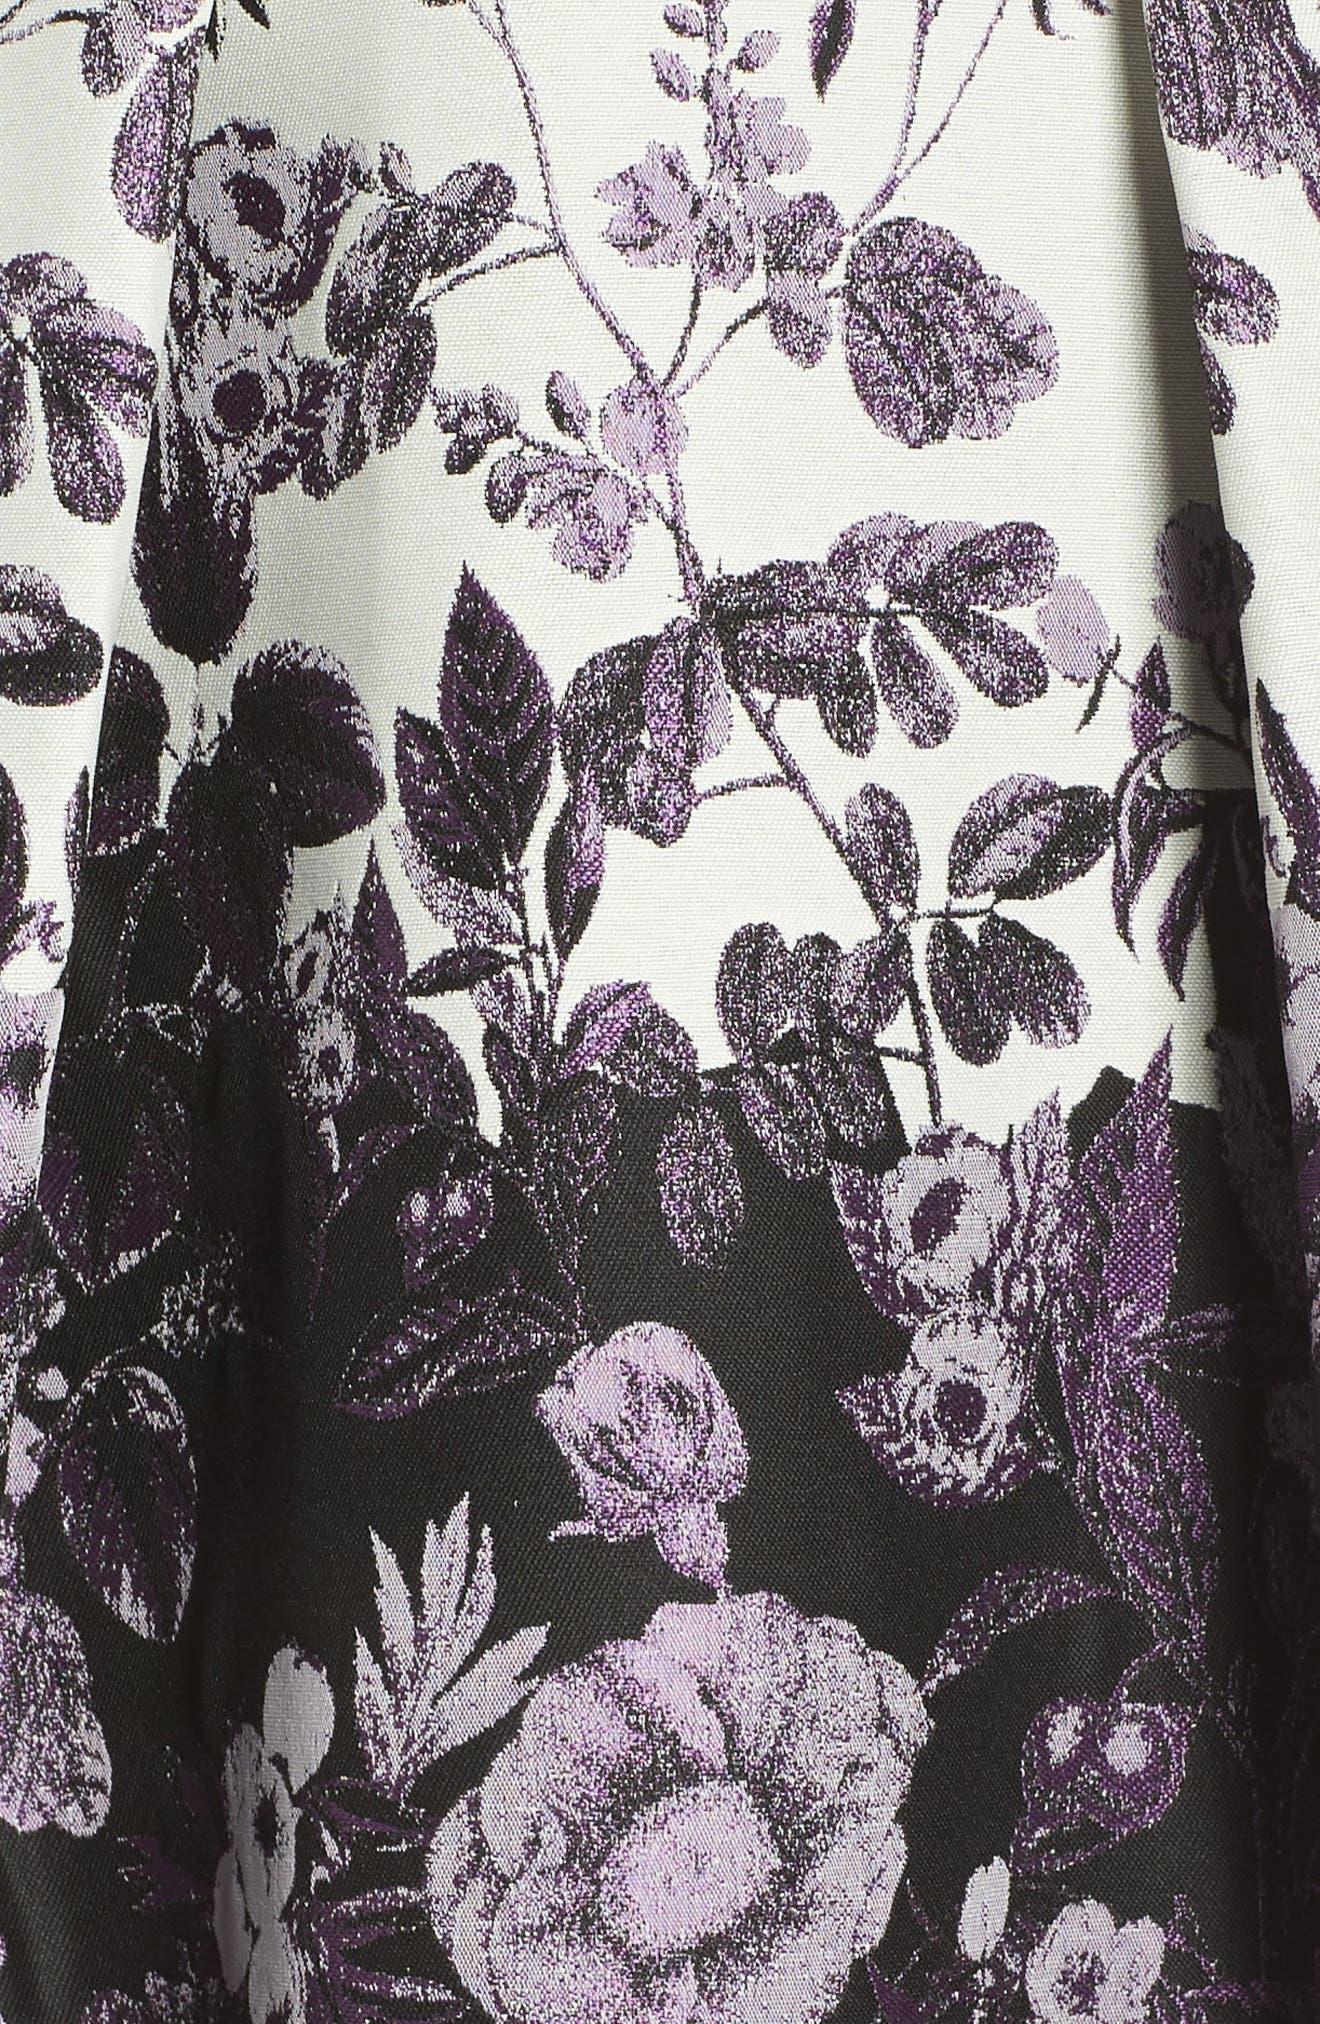 VINCE CAMUTO, Floral Jacquard Fit and Flare Dress, Alternate thumbnail 6, color, PURPLE MULTI